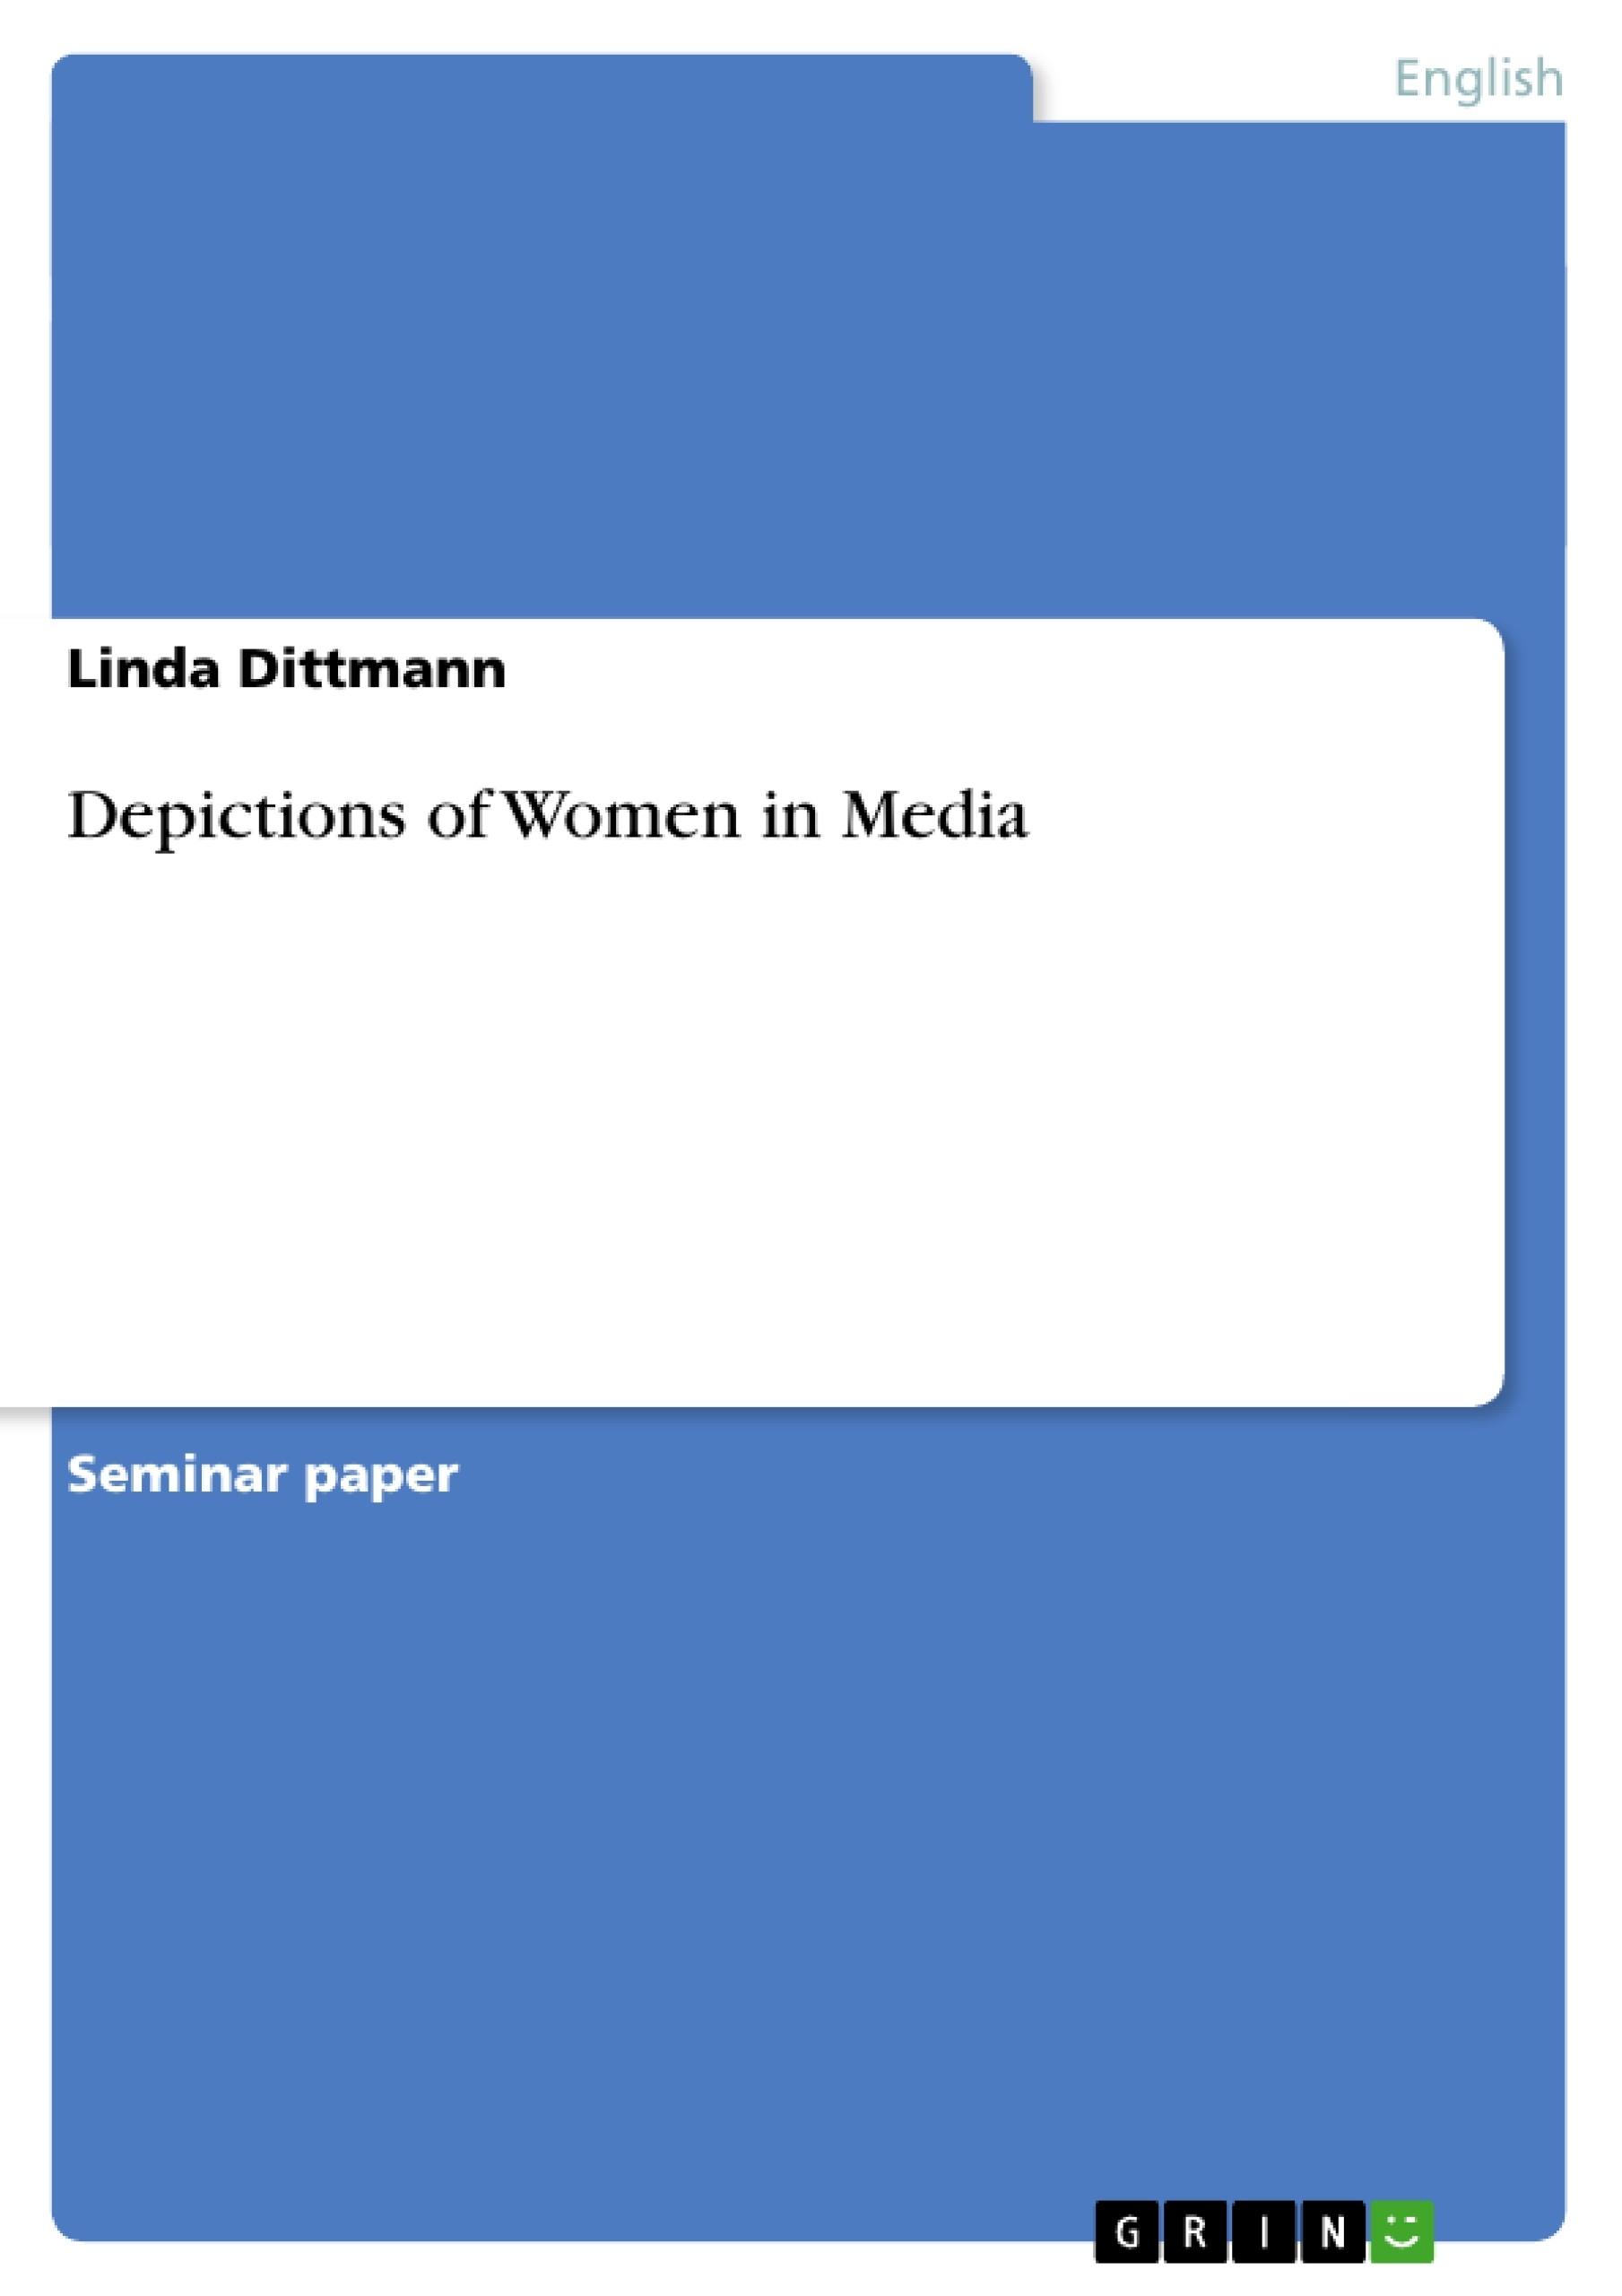 Title: Depictions of Women in Media